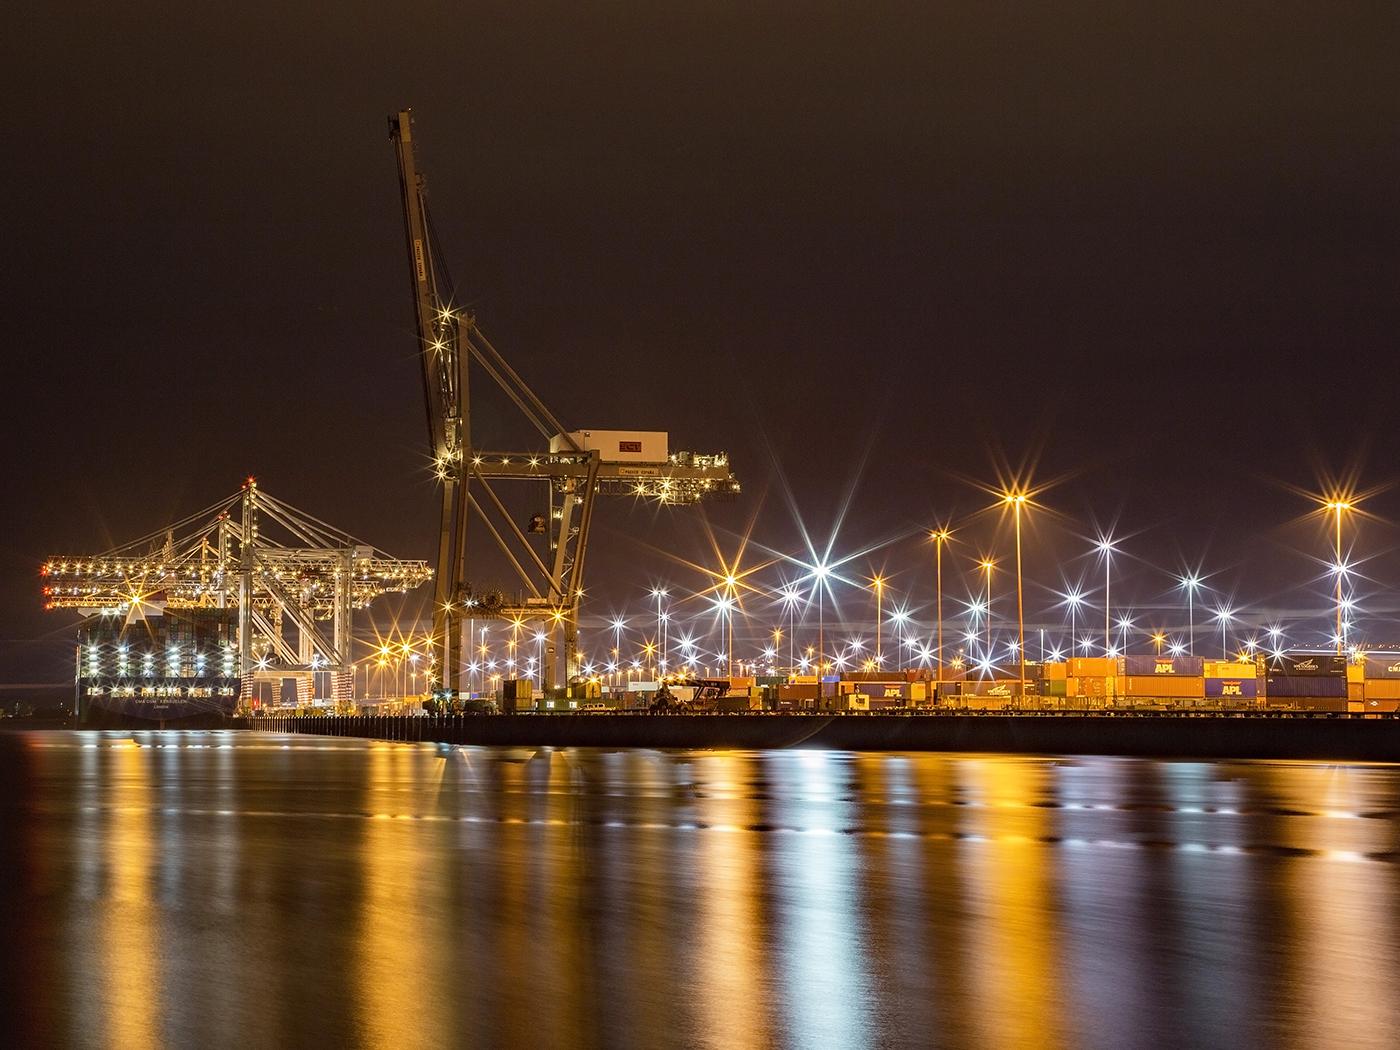 'The docks at night' by Sarah Shelley